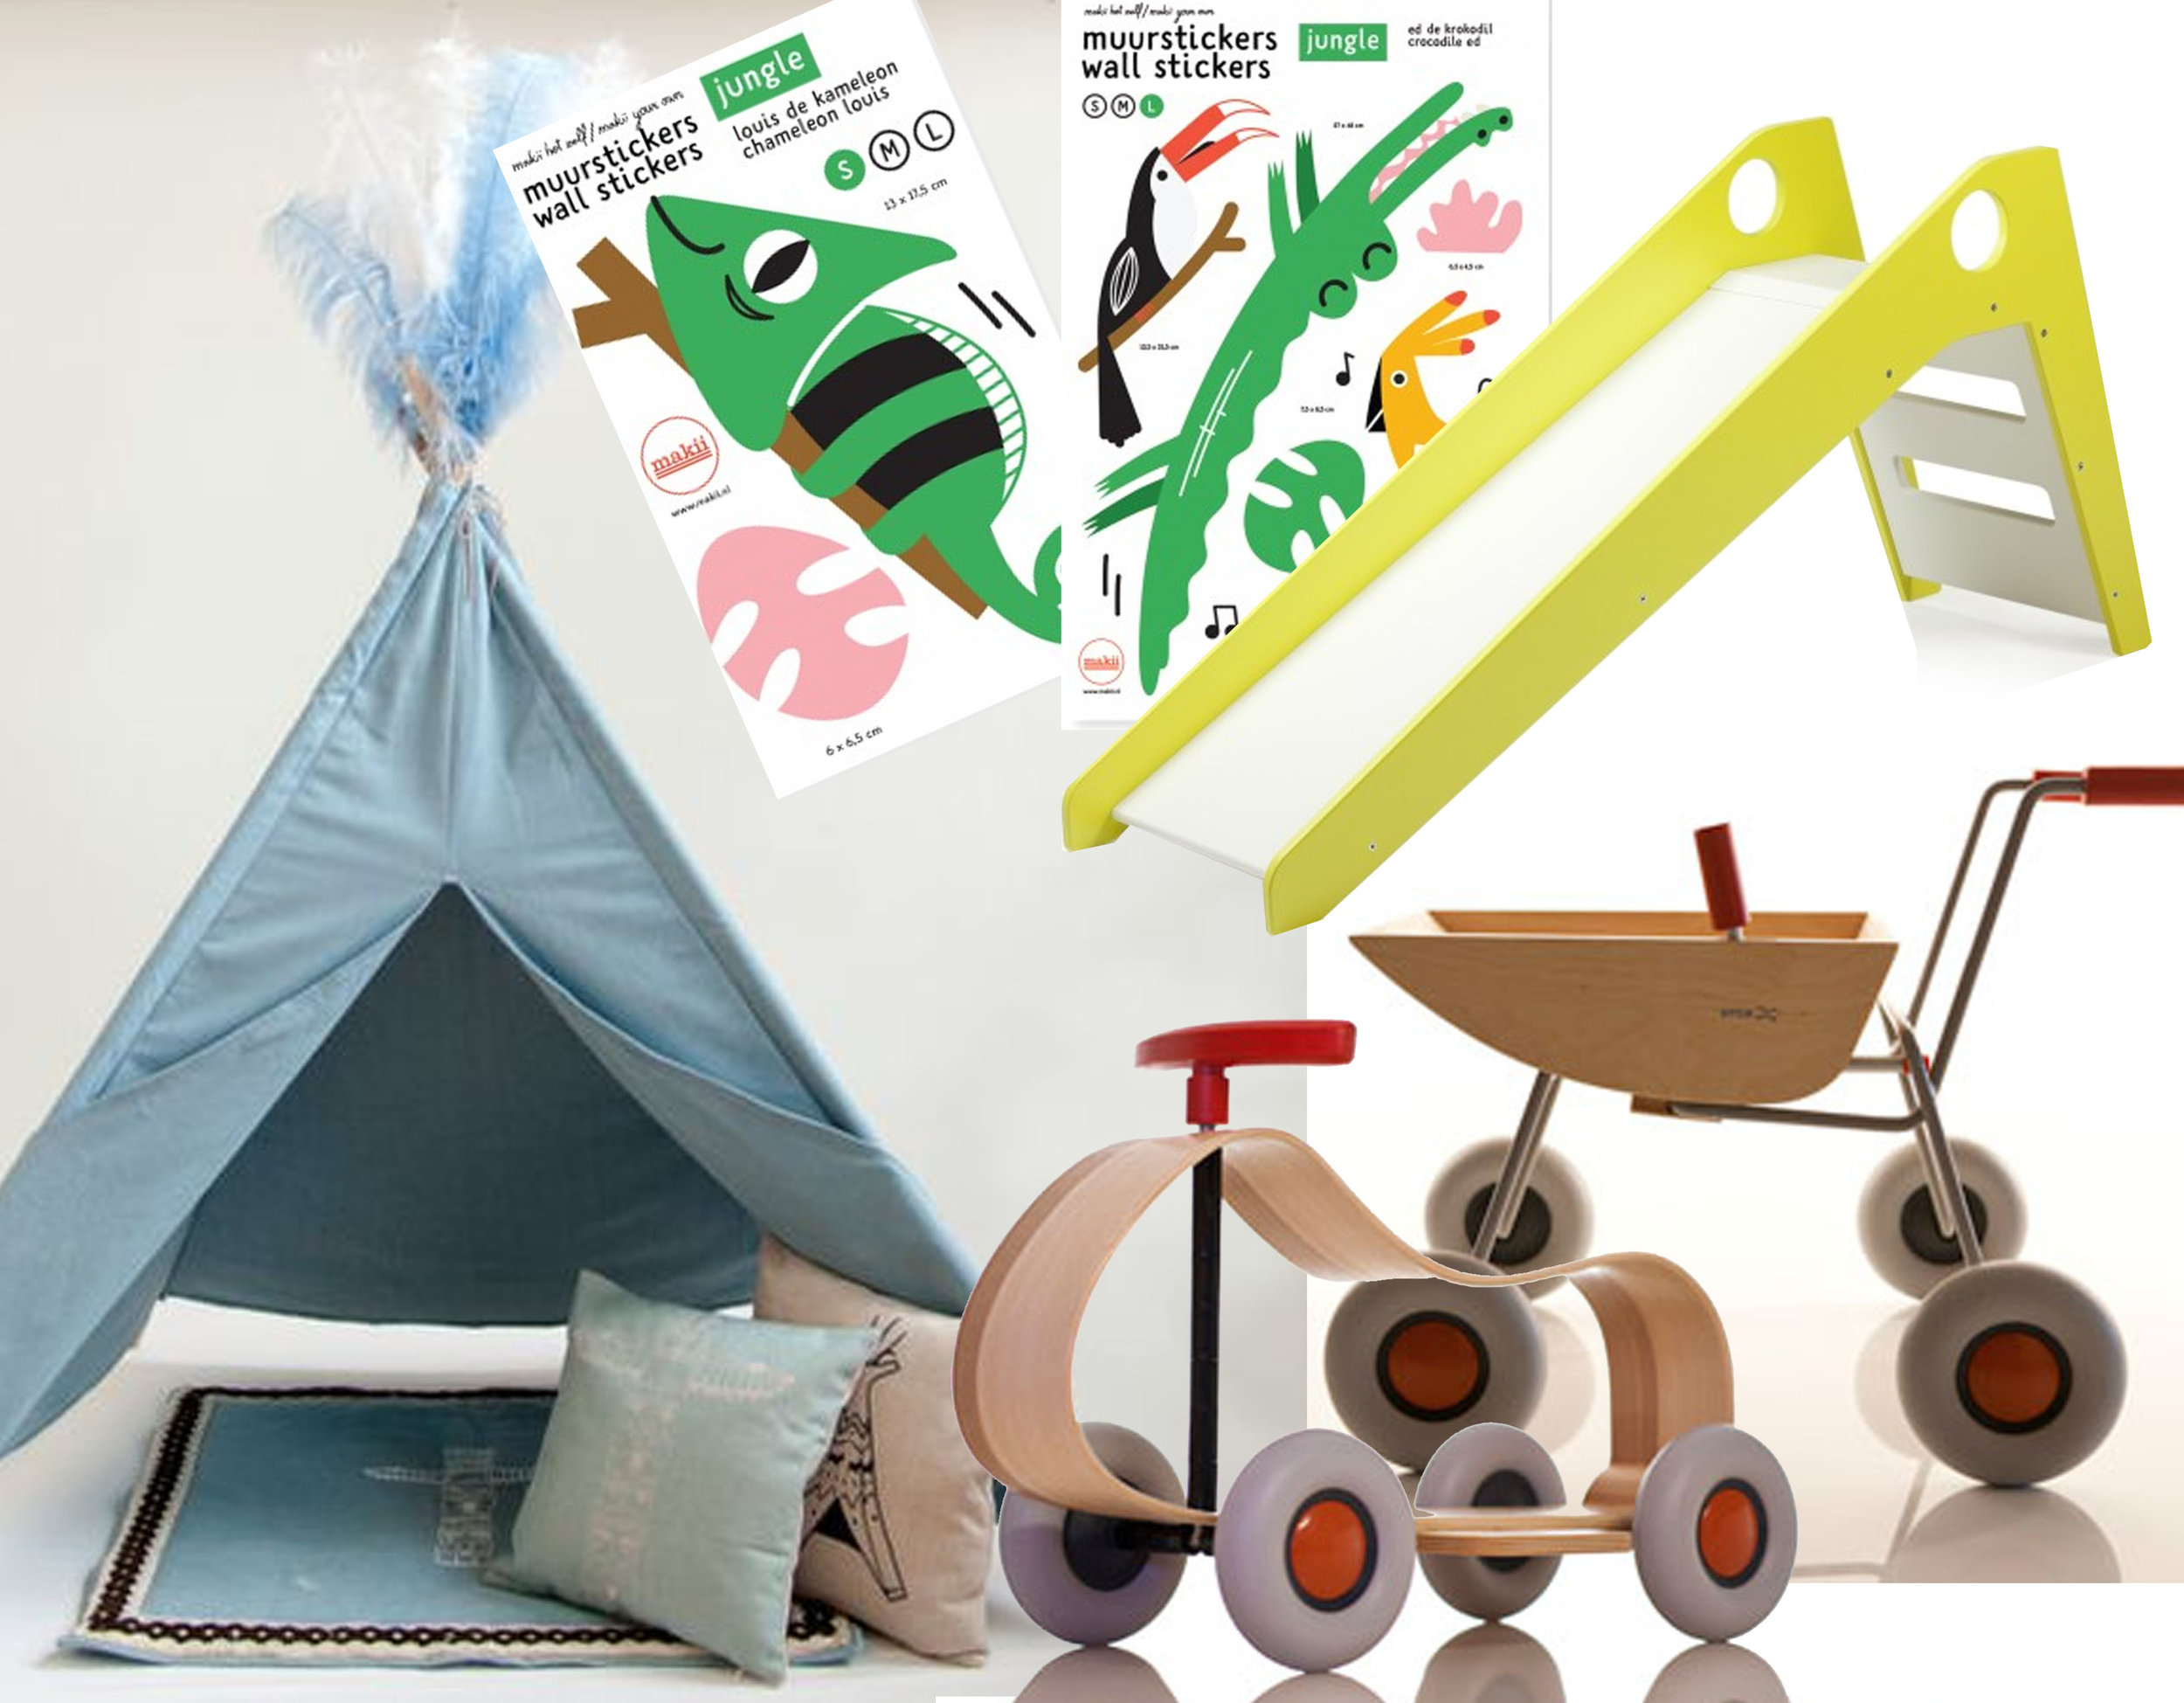 Denim tent for kids  My Own Little Indian  - wall sticker  Makii  - Slide Maxx  Arthur and Friends  - Sibis toys  Sirch